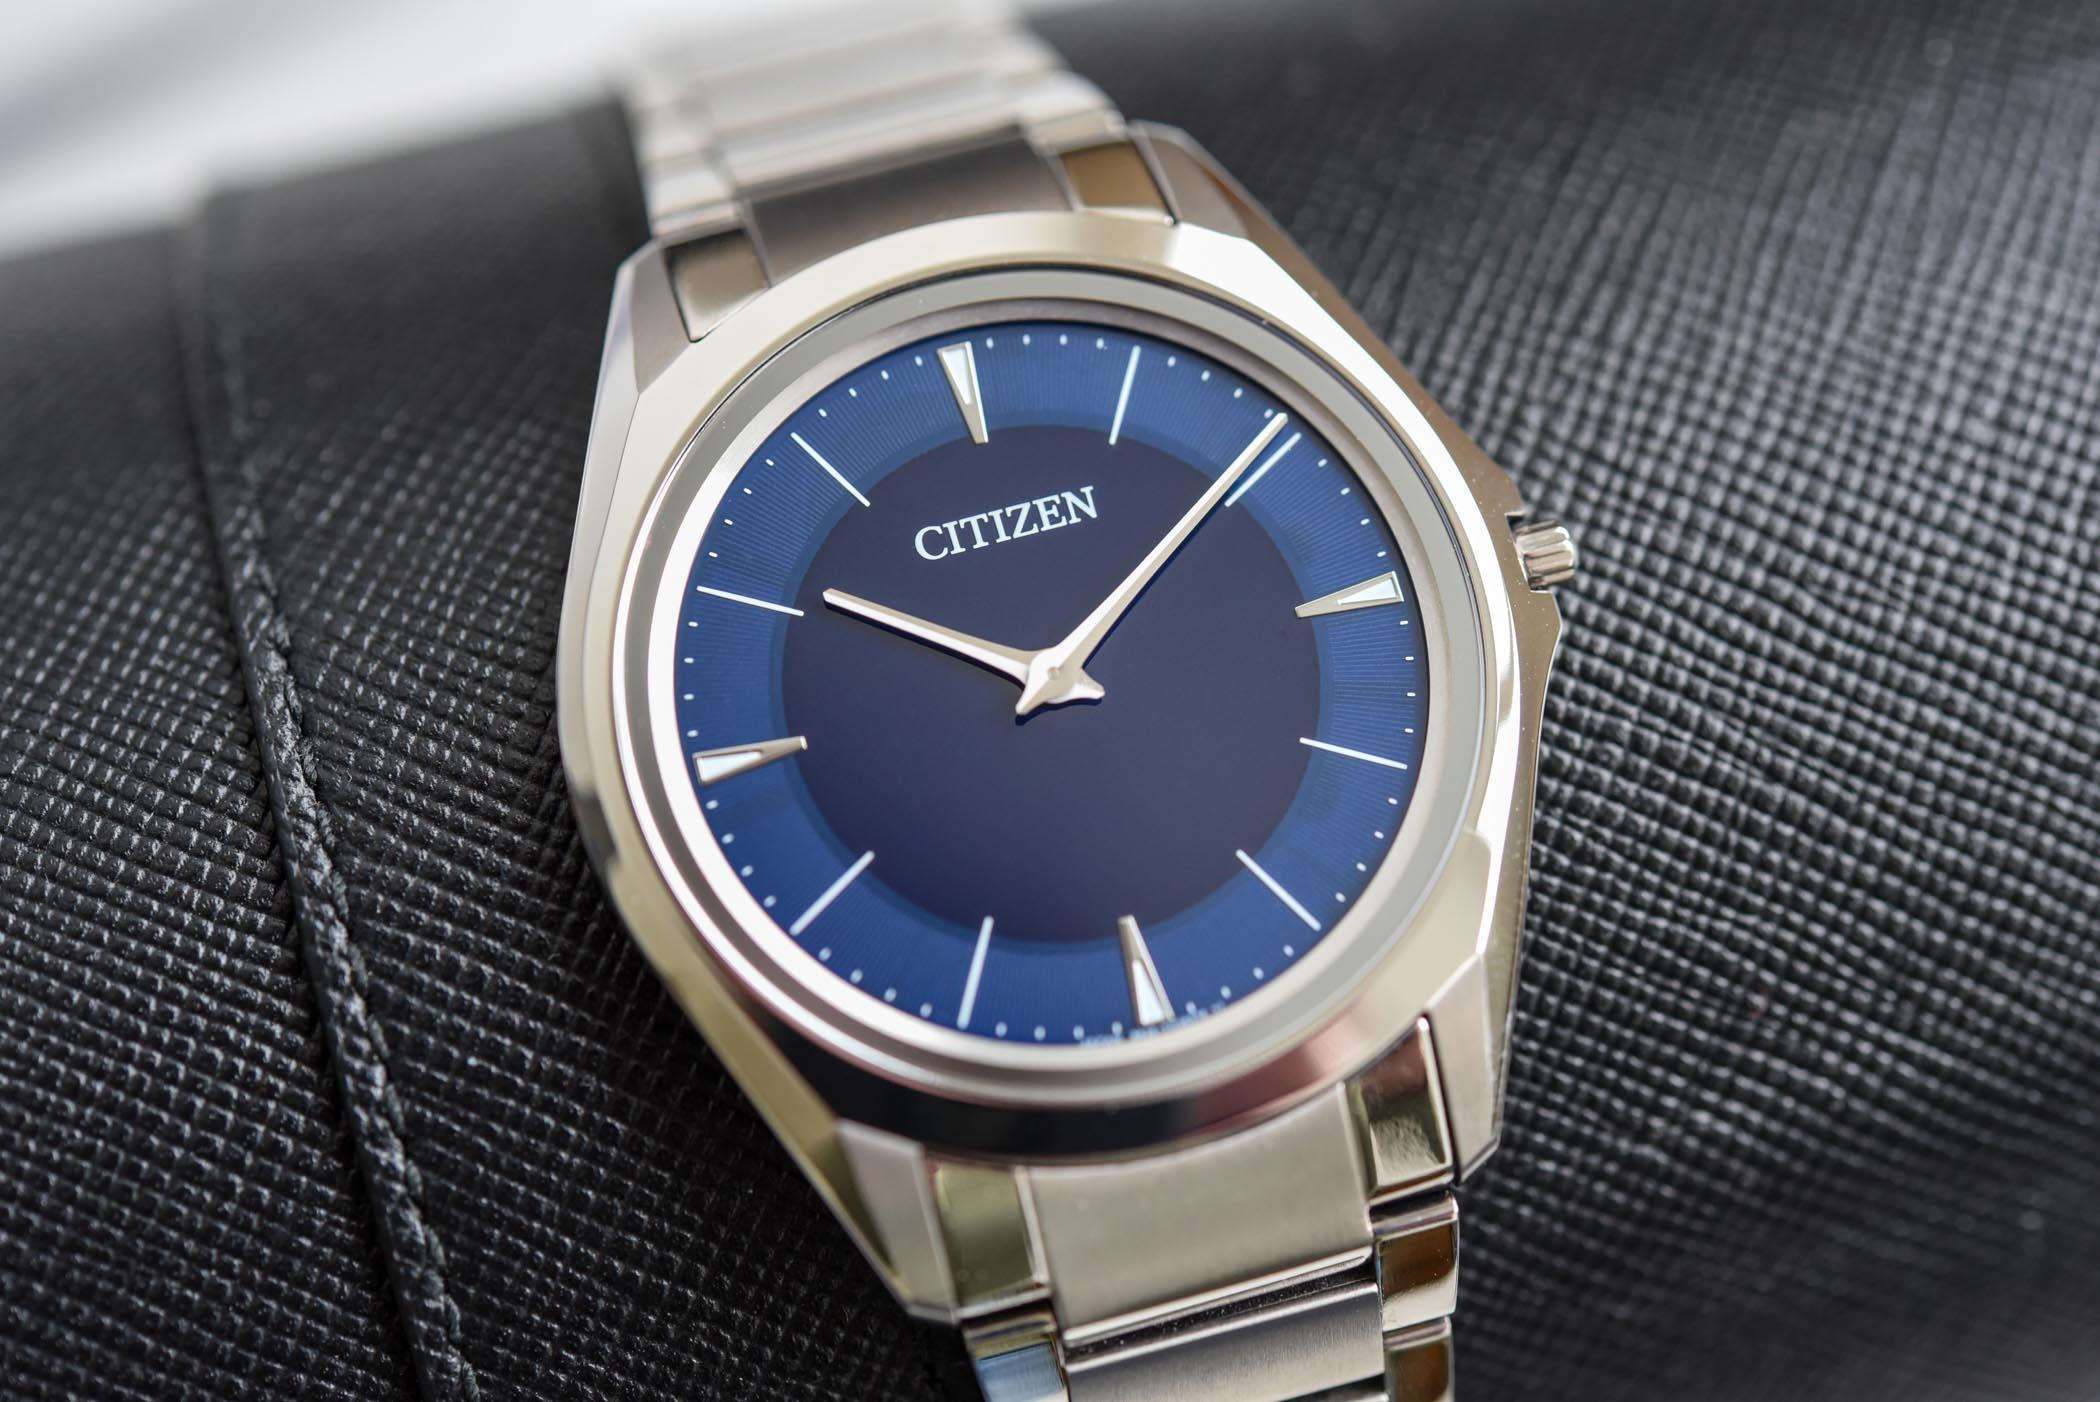 Citizen Eco-Drive One Super Titanium - 3